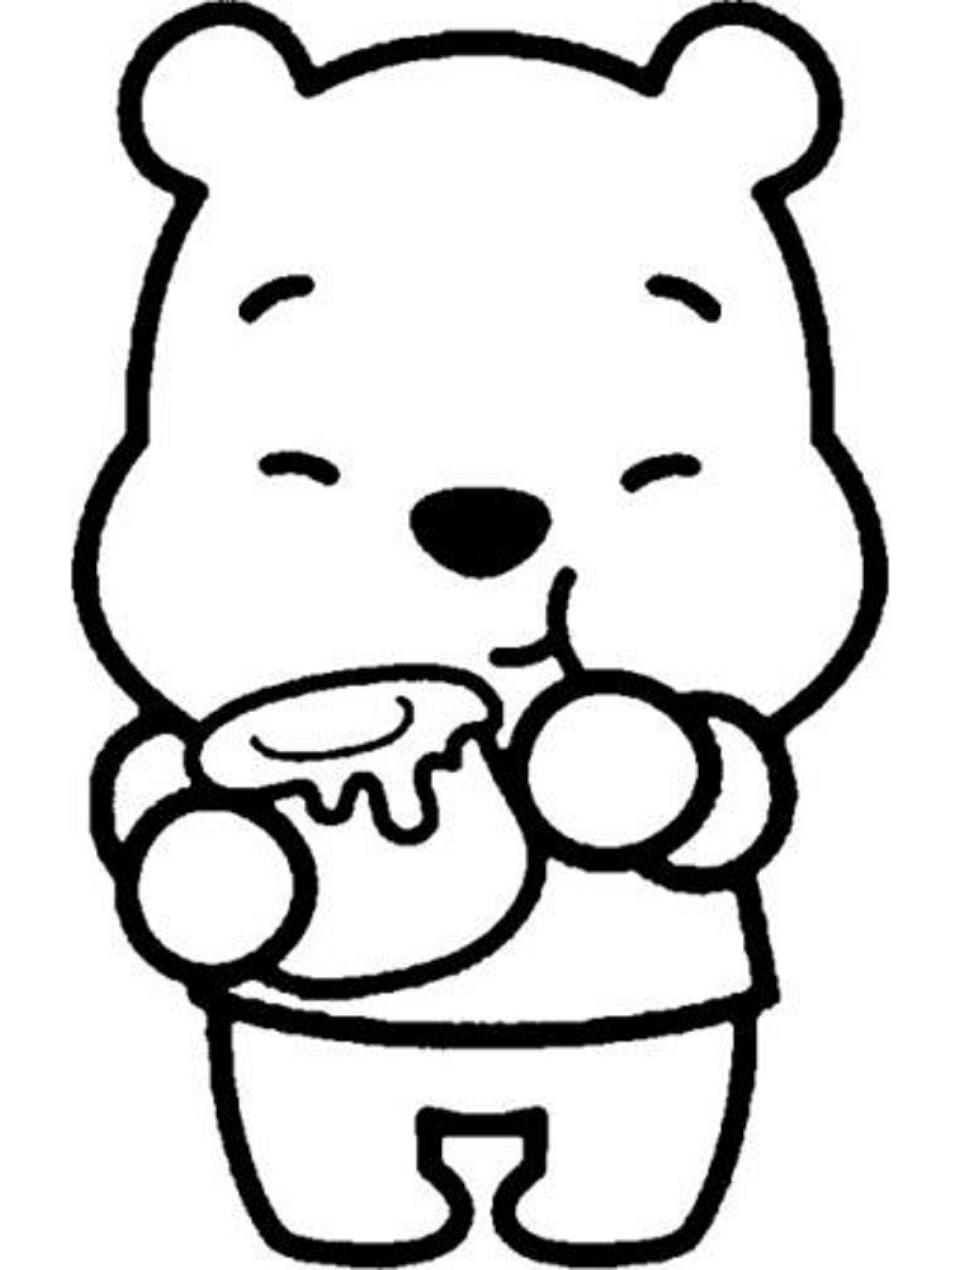 Dibujos De Pooh Kawaii Para Colorear Pintar E Imprimir